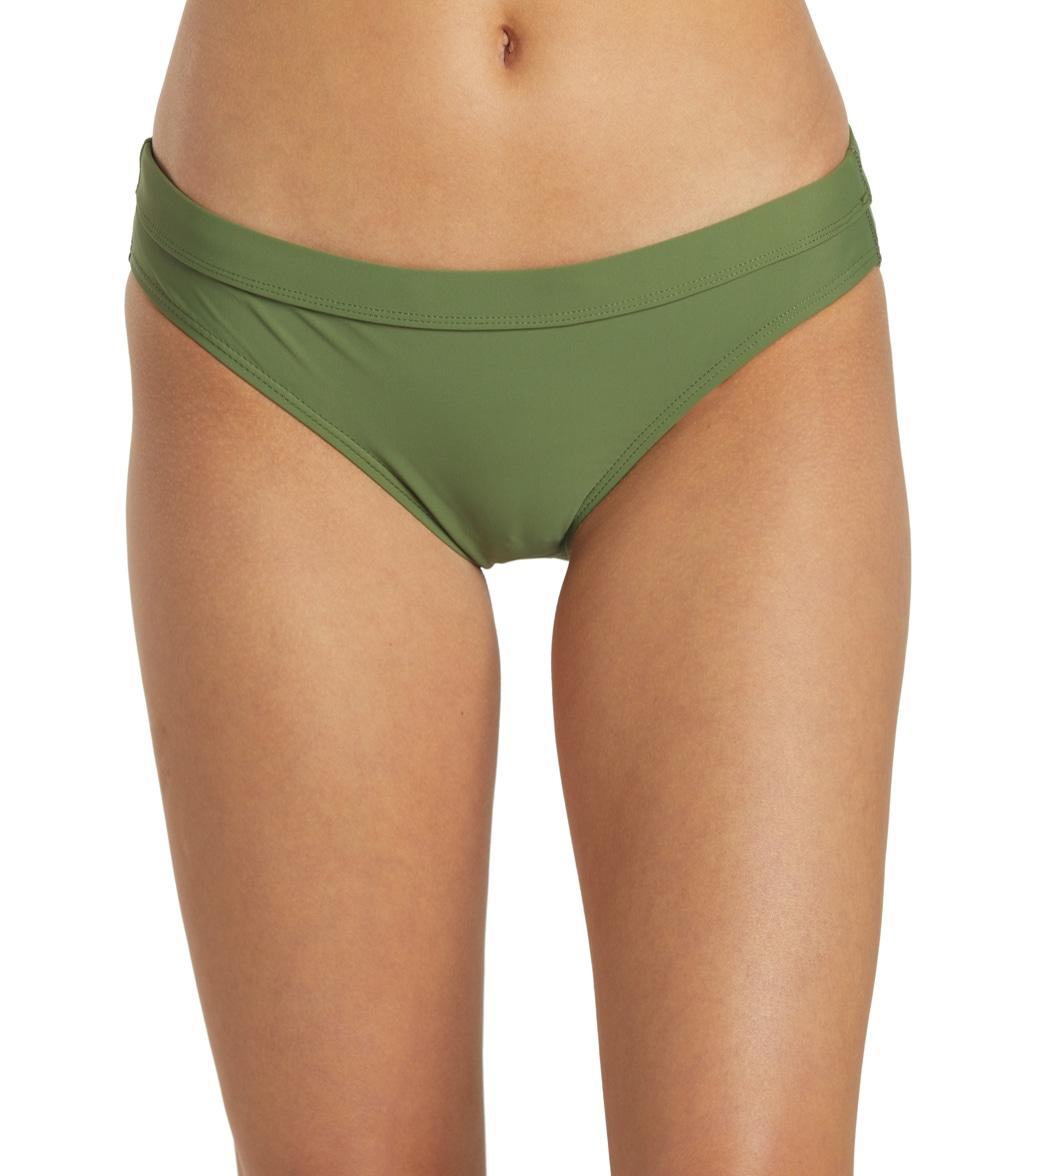 Pantyhose travestis free